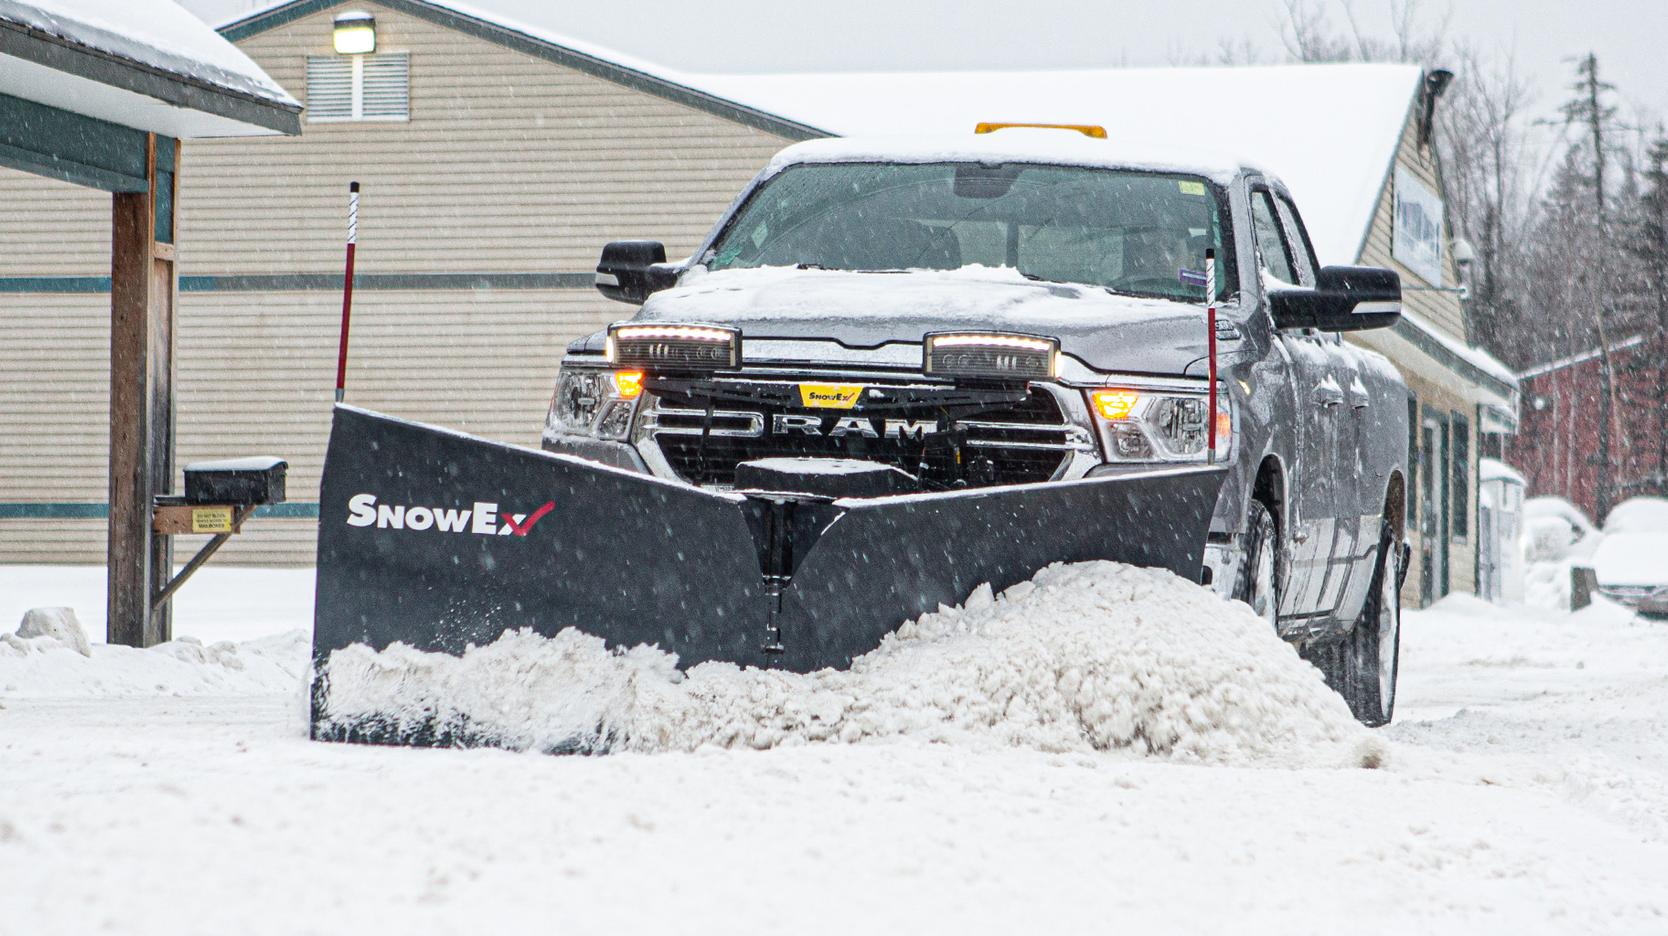 SnowEx RDV V-plow